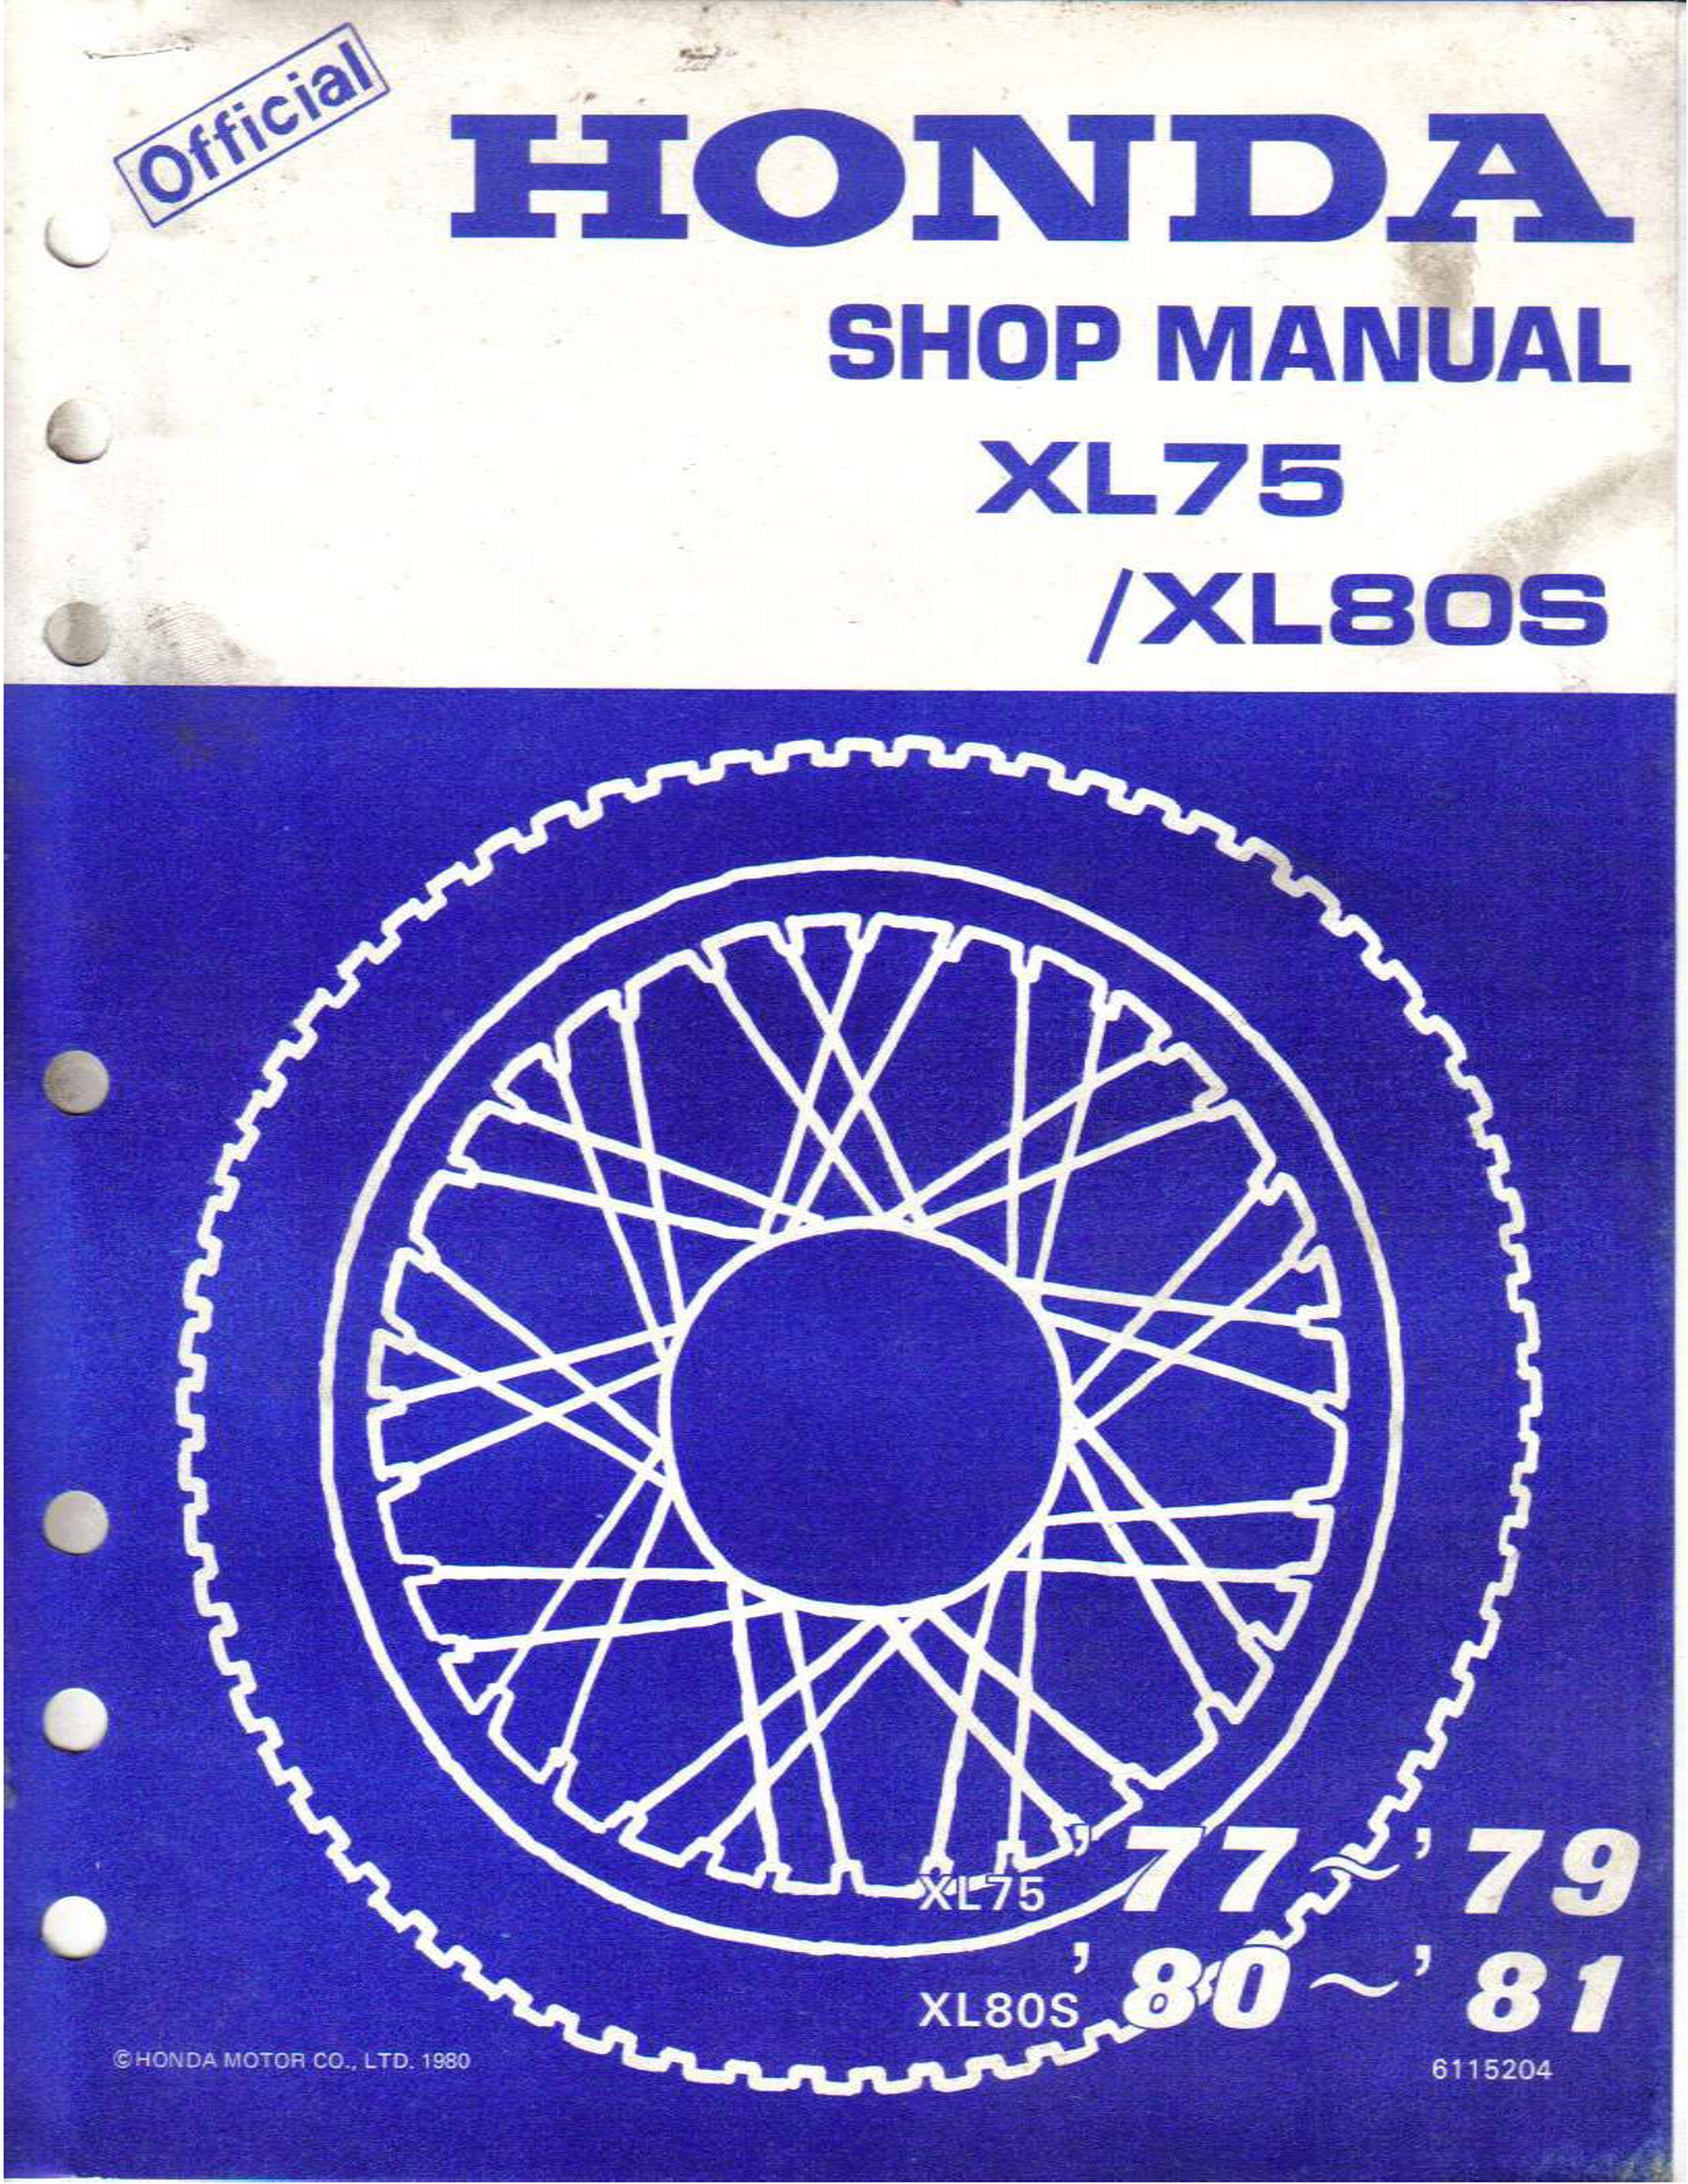 Workshop manual for Honda XL75 (1977-1979)